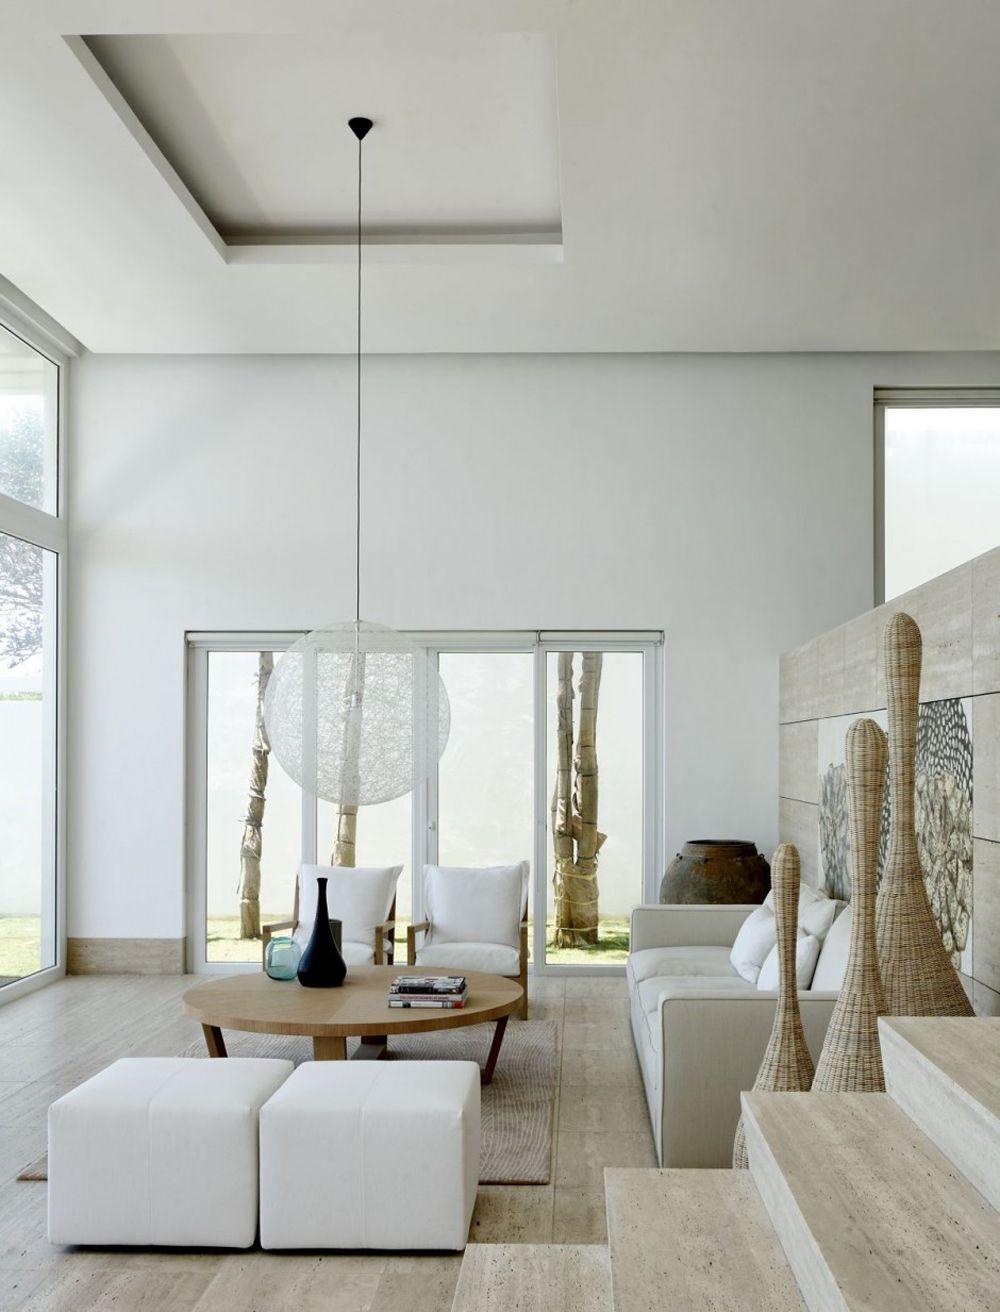 Elements Of Design Design Elements Shape And Form Interior